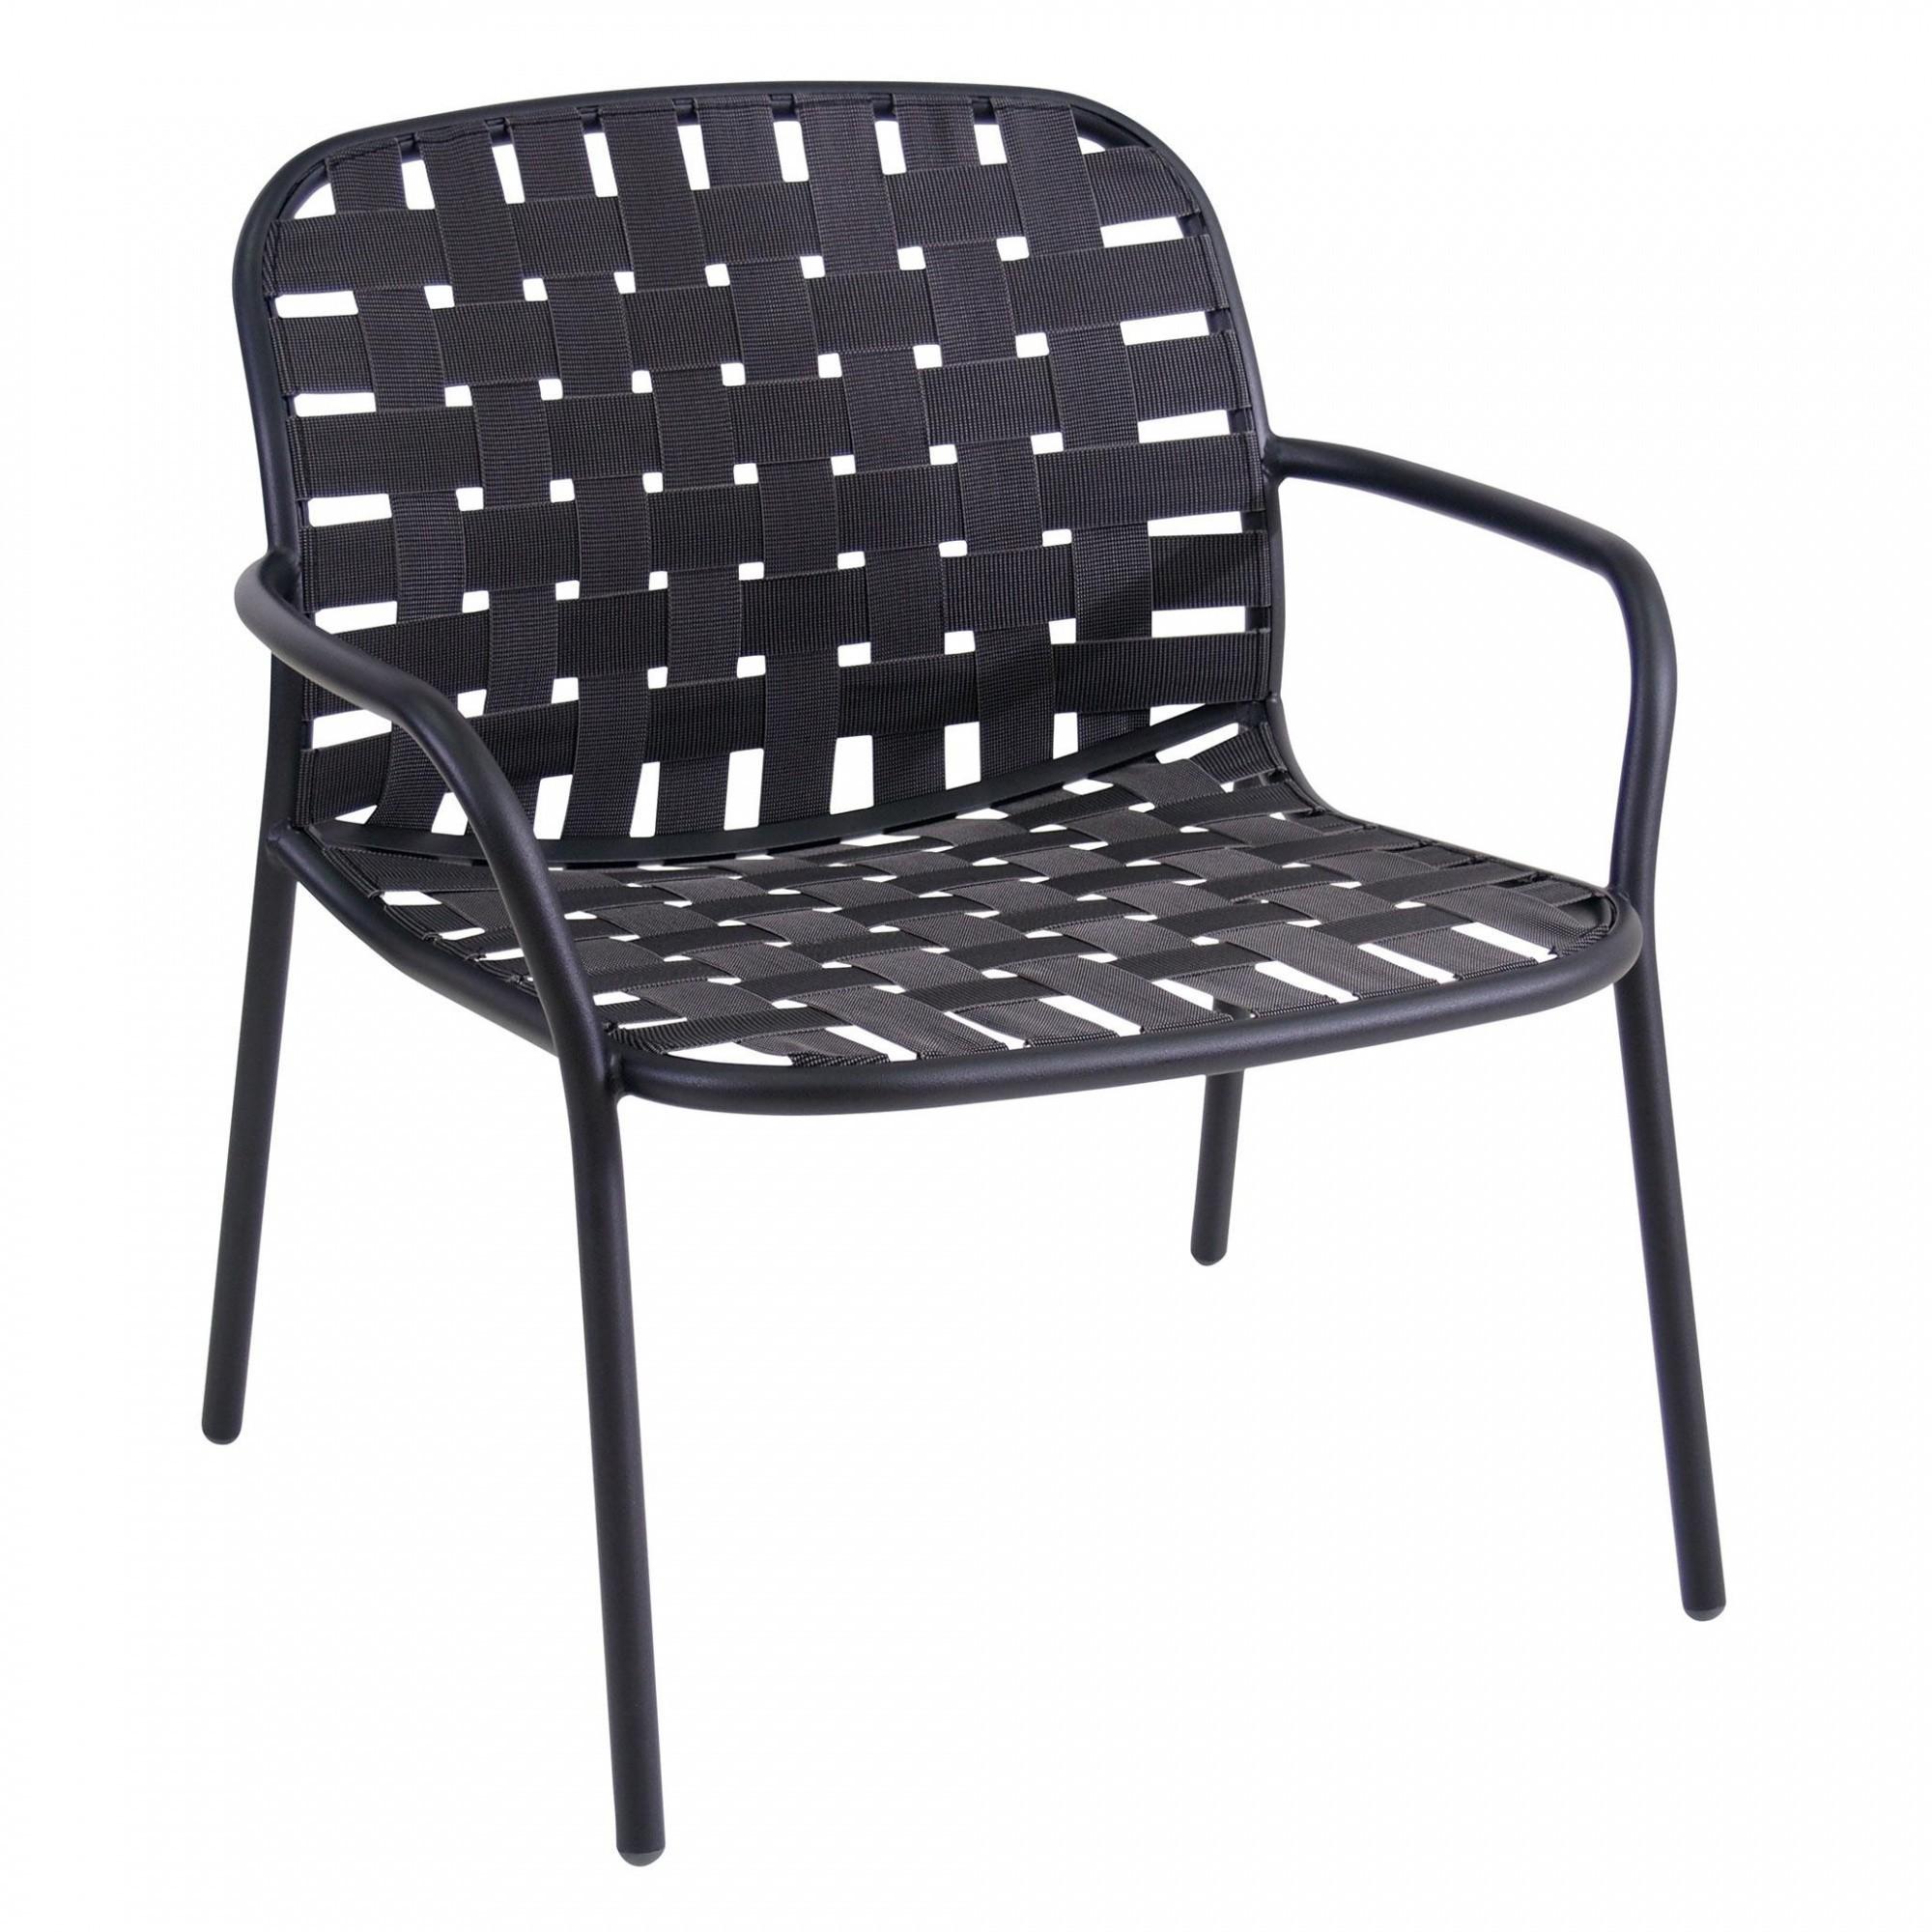 Enjoyable Yard Garden Lounge Chair Cjindustries Chair Design For Home Cjindustriesco